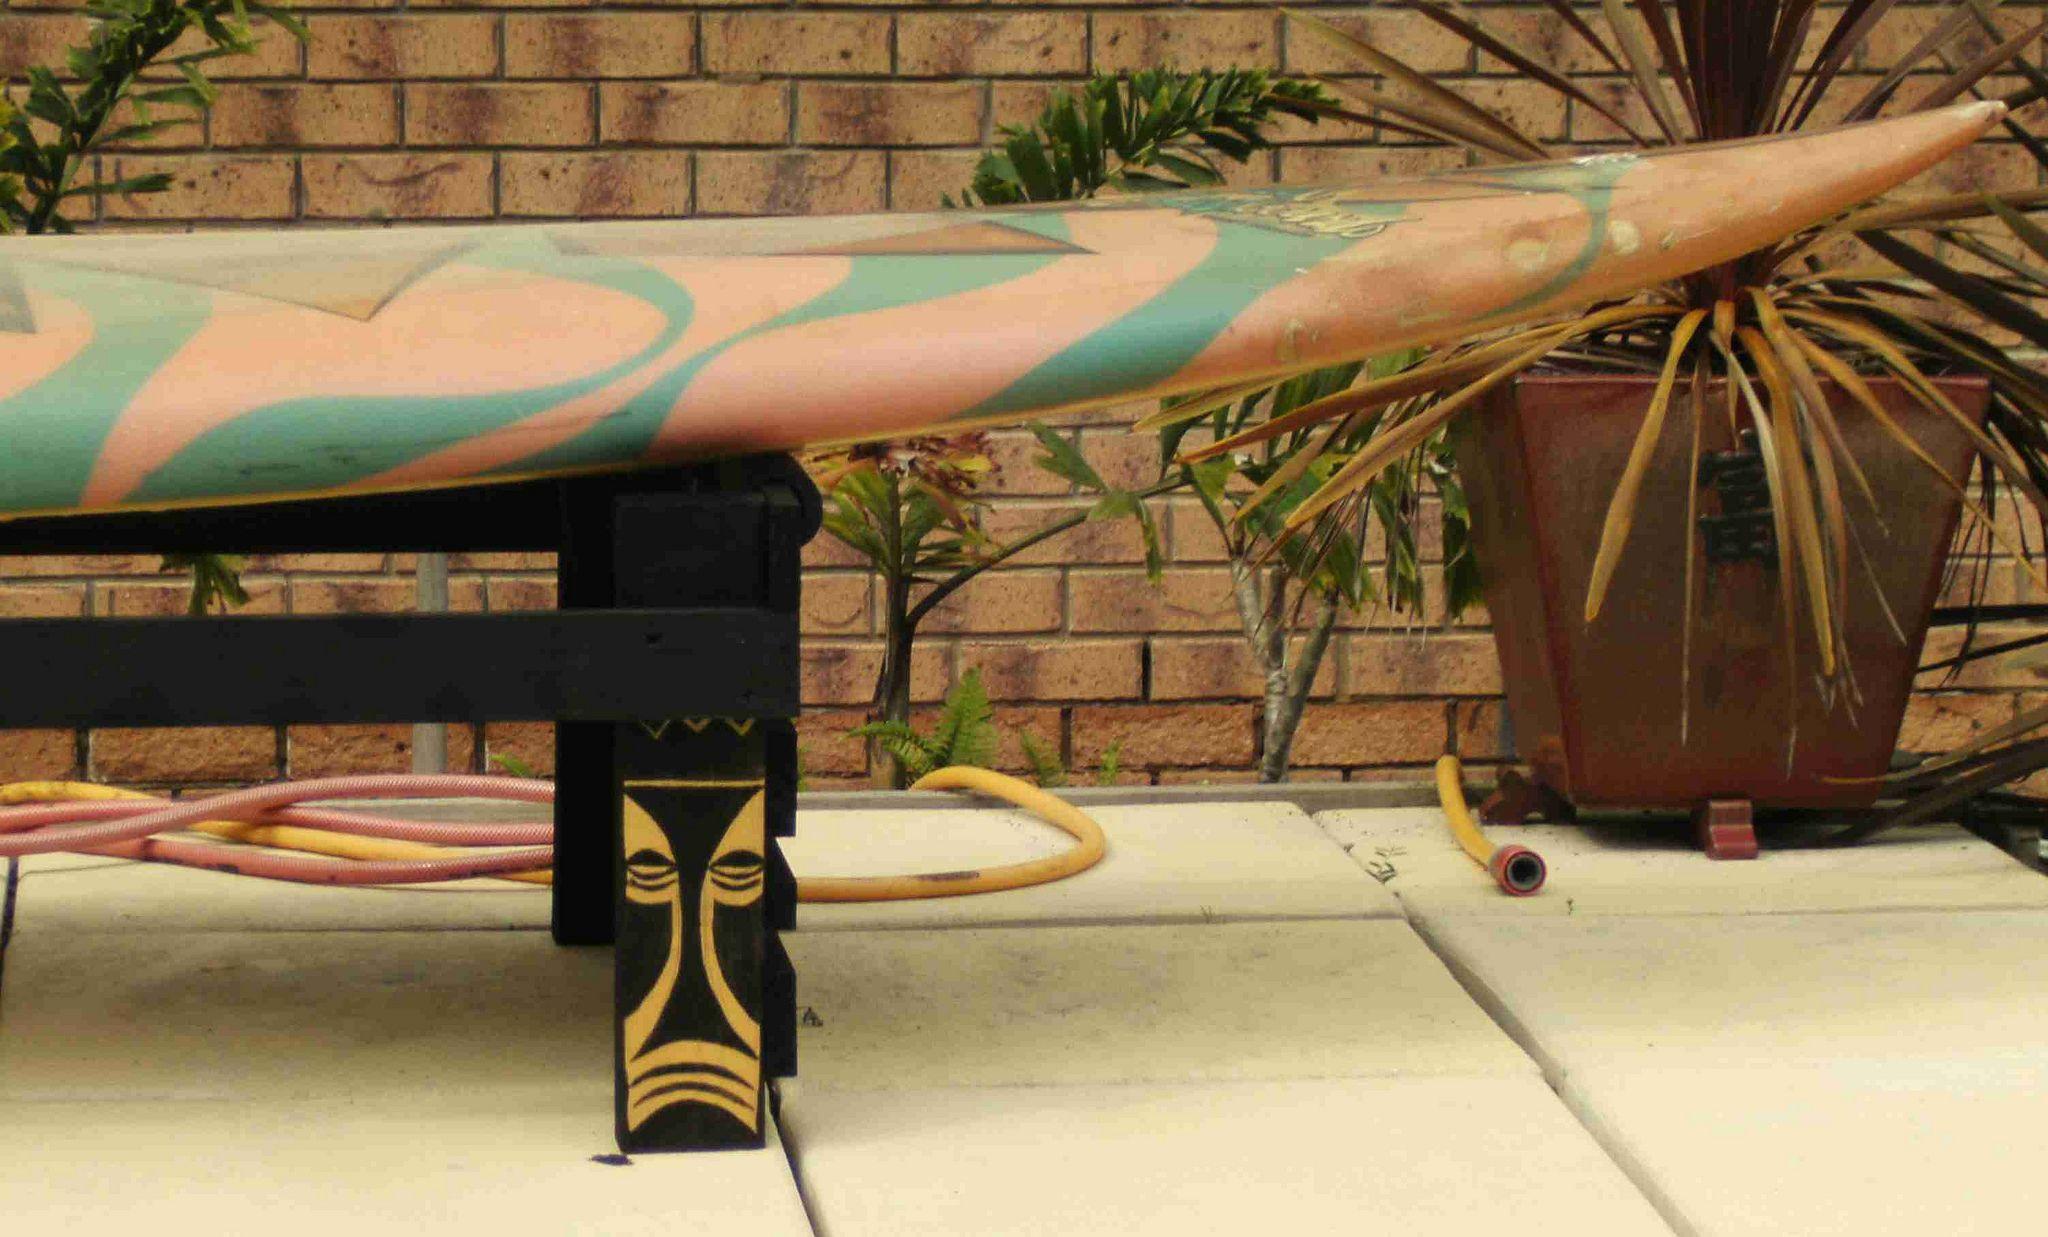 https://flic.kr/p/brPTw3   Closeup of tiki detail on poolside surfboard bench   Digital camera